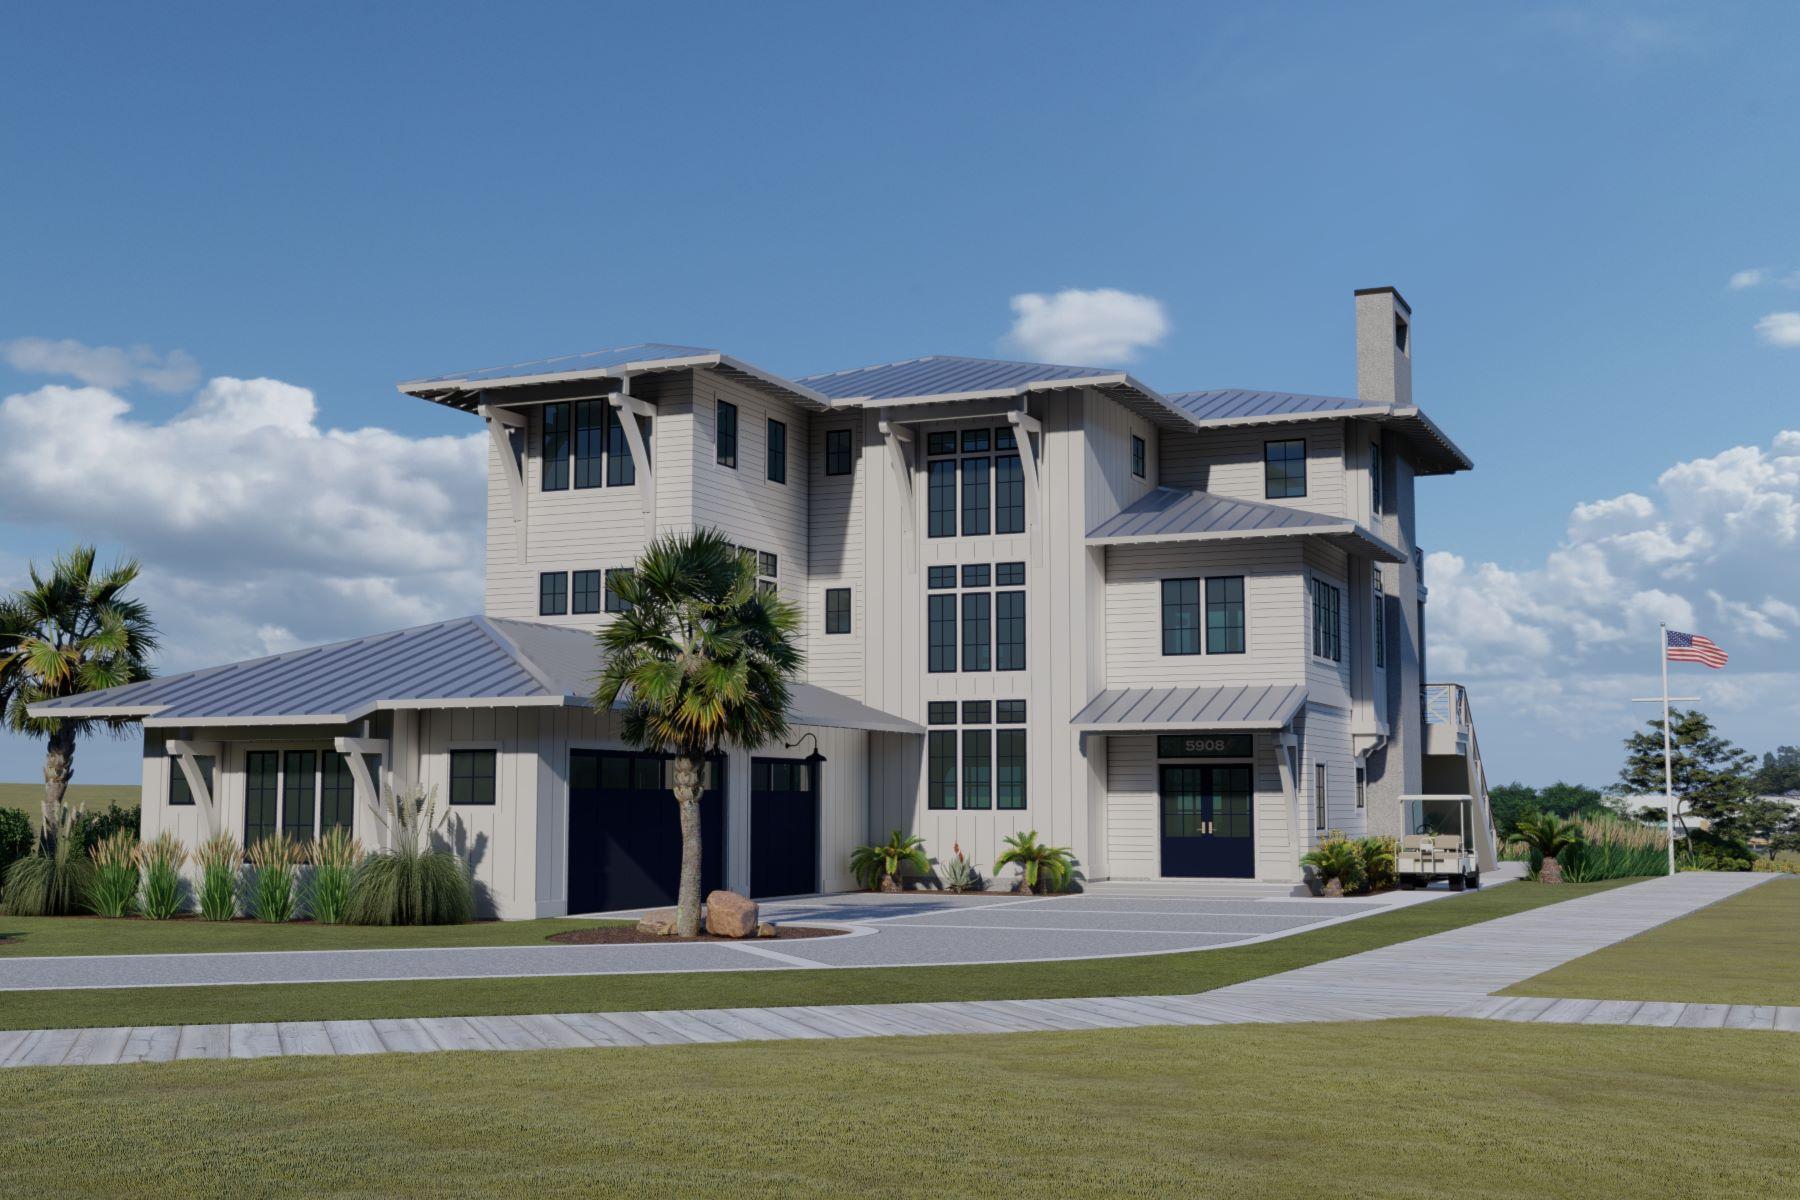 Single Family Homes для того Продажа на Waterfront Proposed design+build 5908 Nautical Isle Court Wilmington, Северная Каролина 28409 Соединенные Штаты